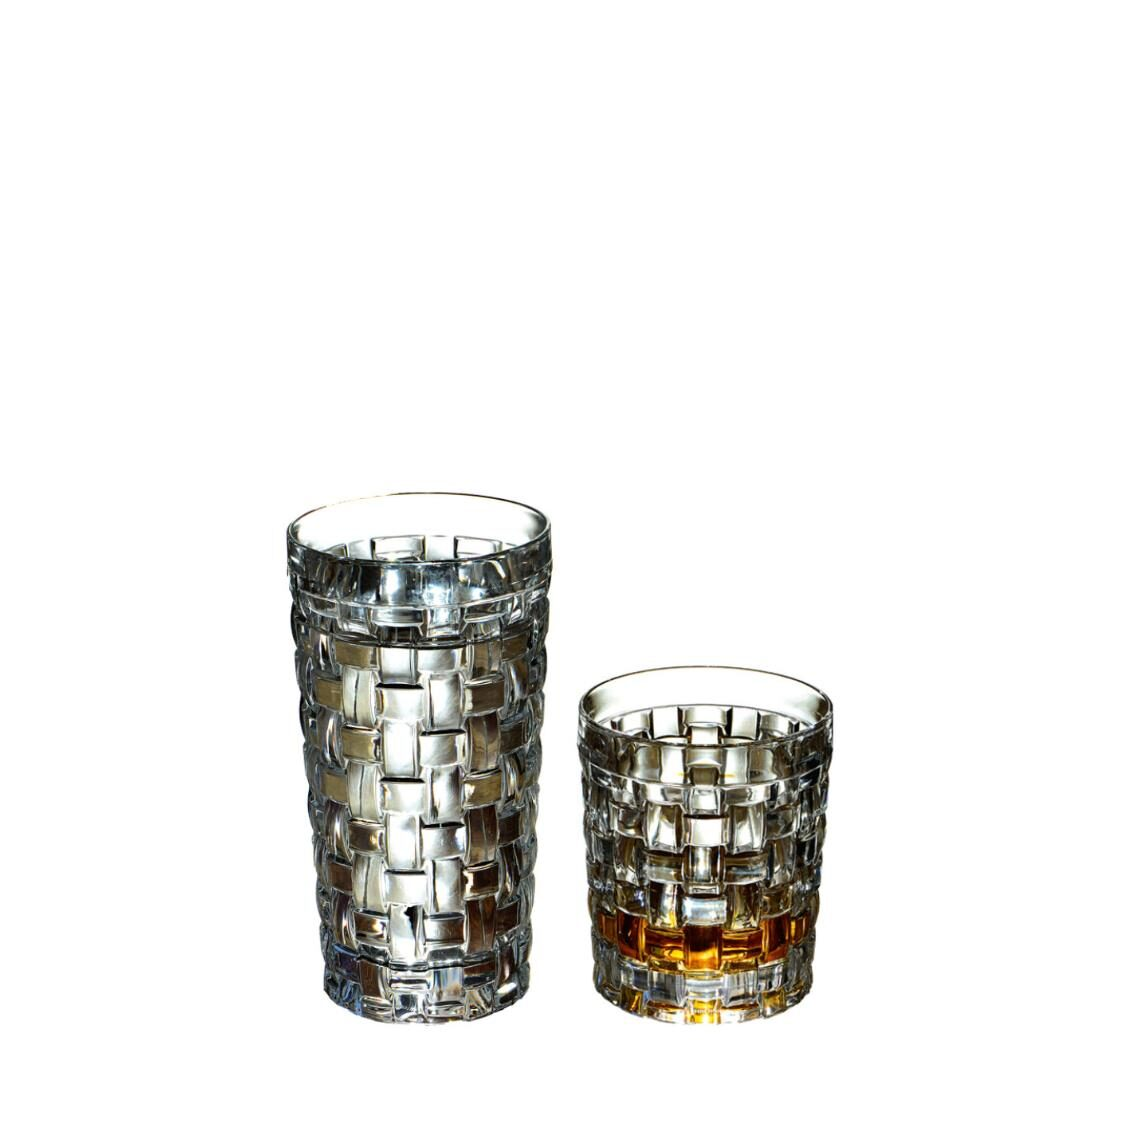 Nachtmann Lead Free Crystal Tumbler Bossa Nova R-102710